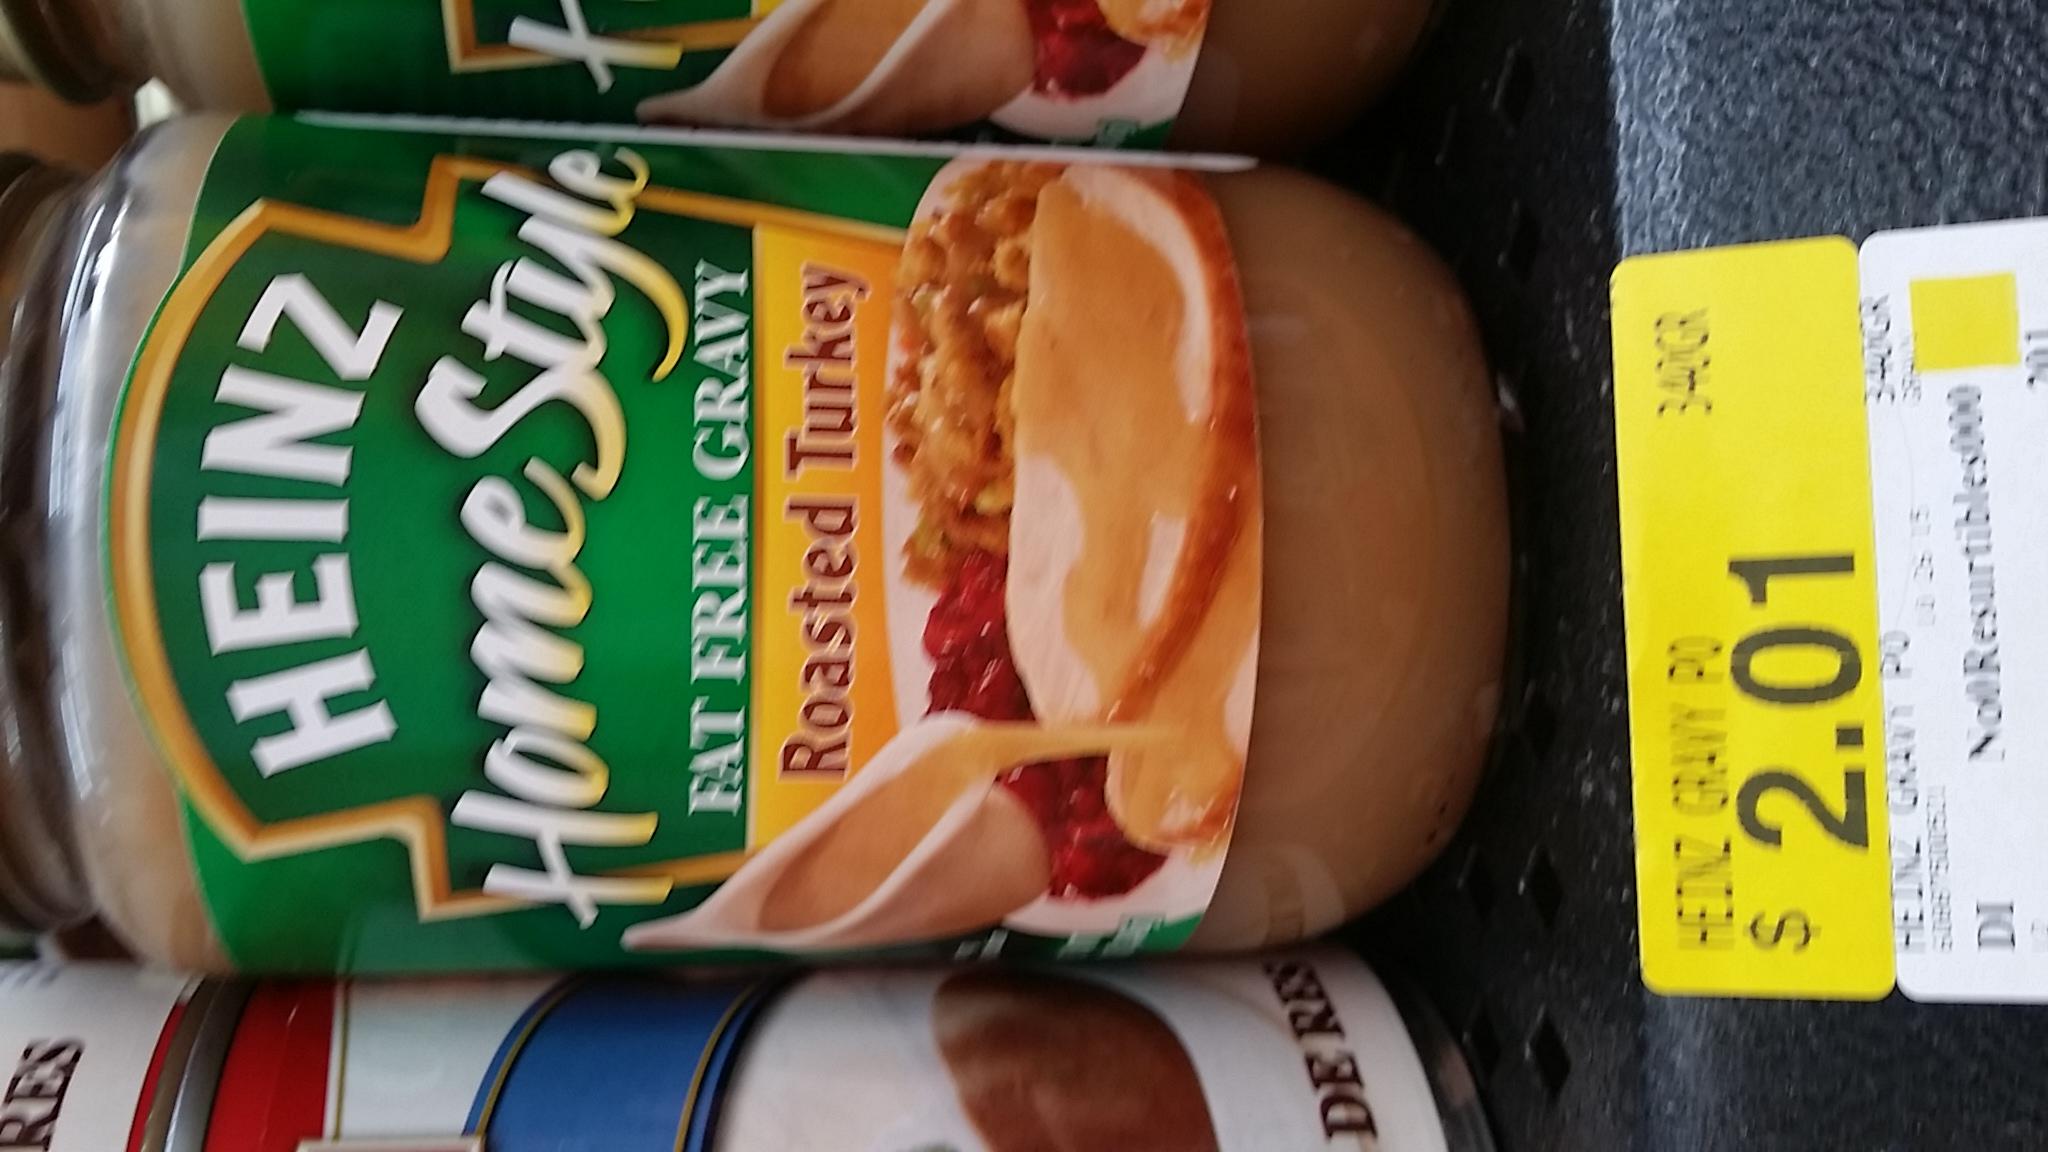 Walmart Patio Santa Fé:  Salsa Gravy Heinz $2.01